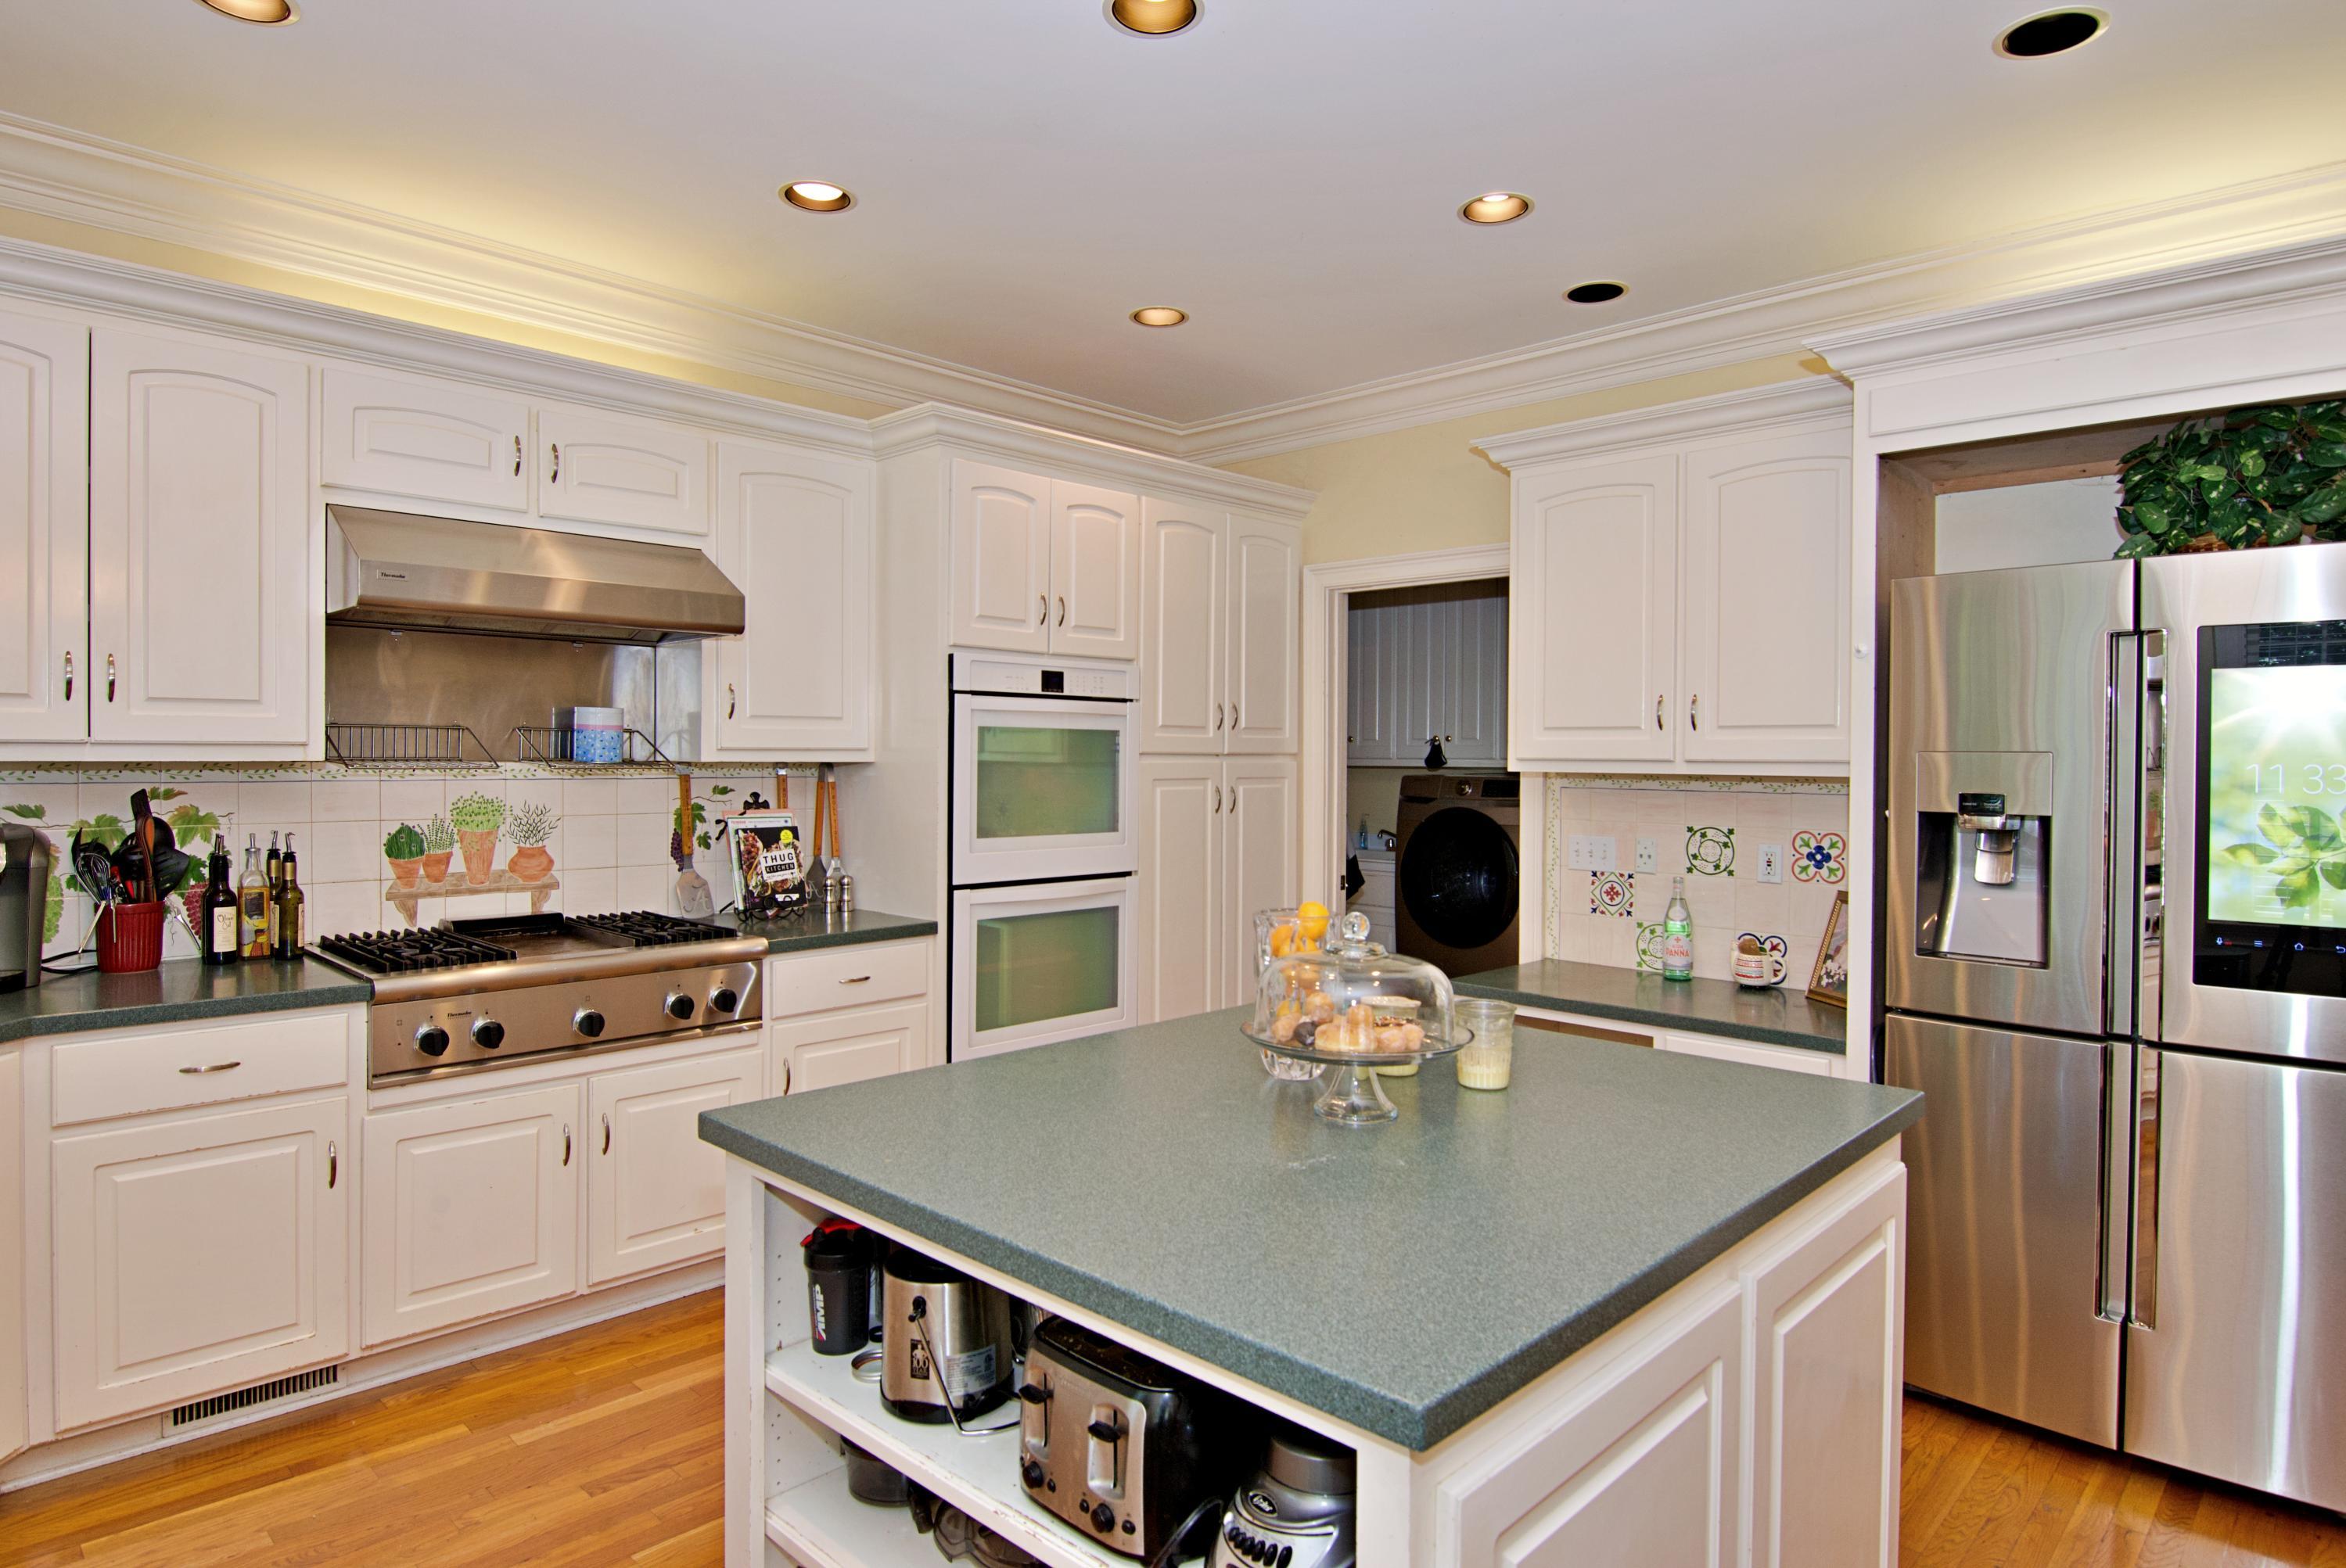 Coosaw Creek Country Club Homes For Sale - 4219 Buck Creek, North Charleston, SC - 28